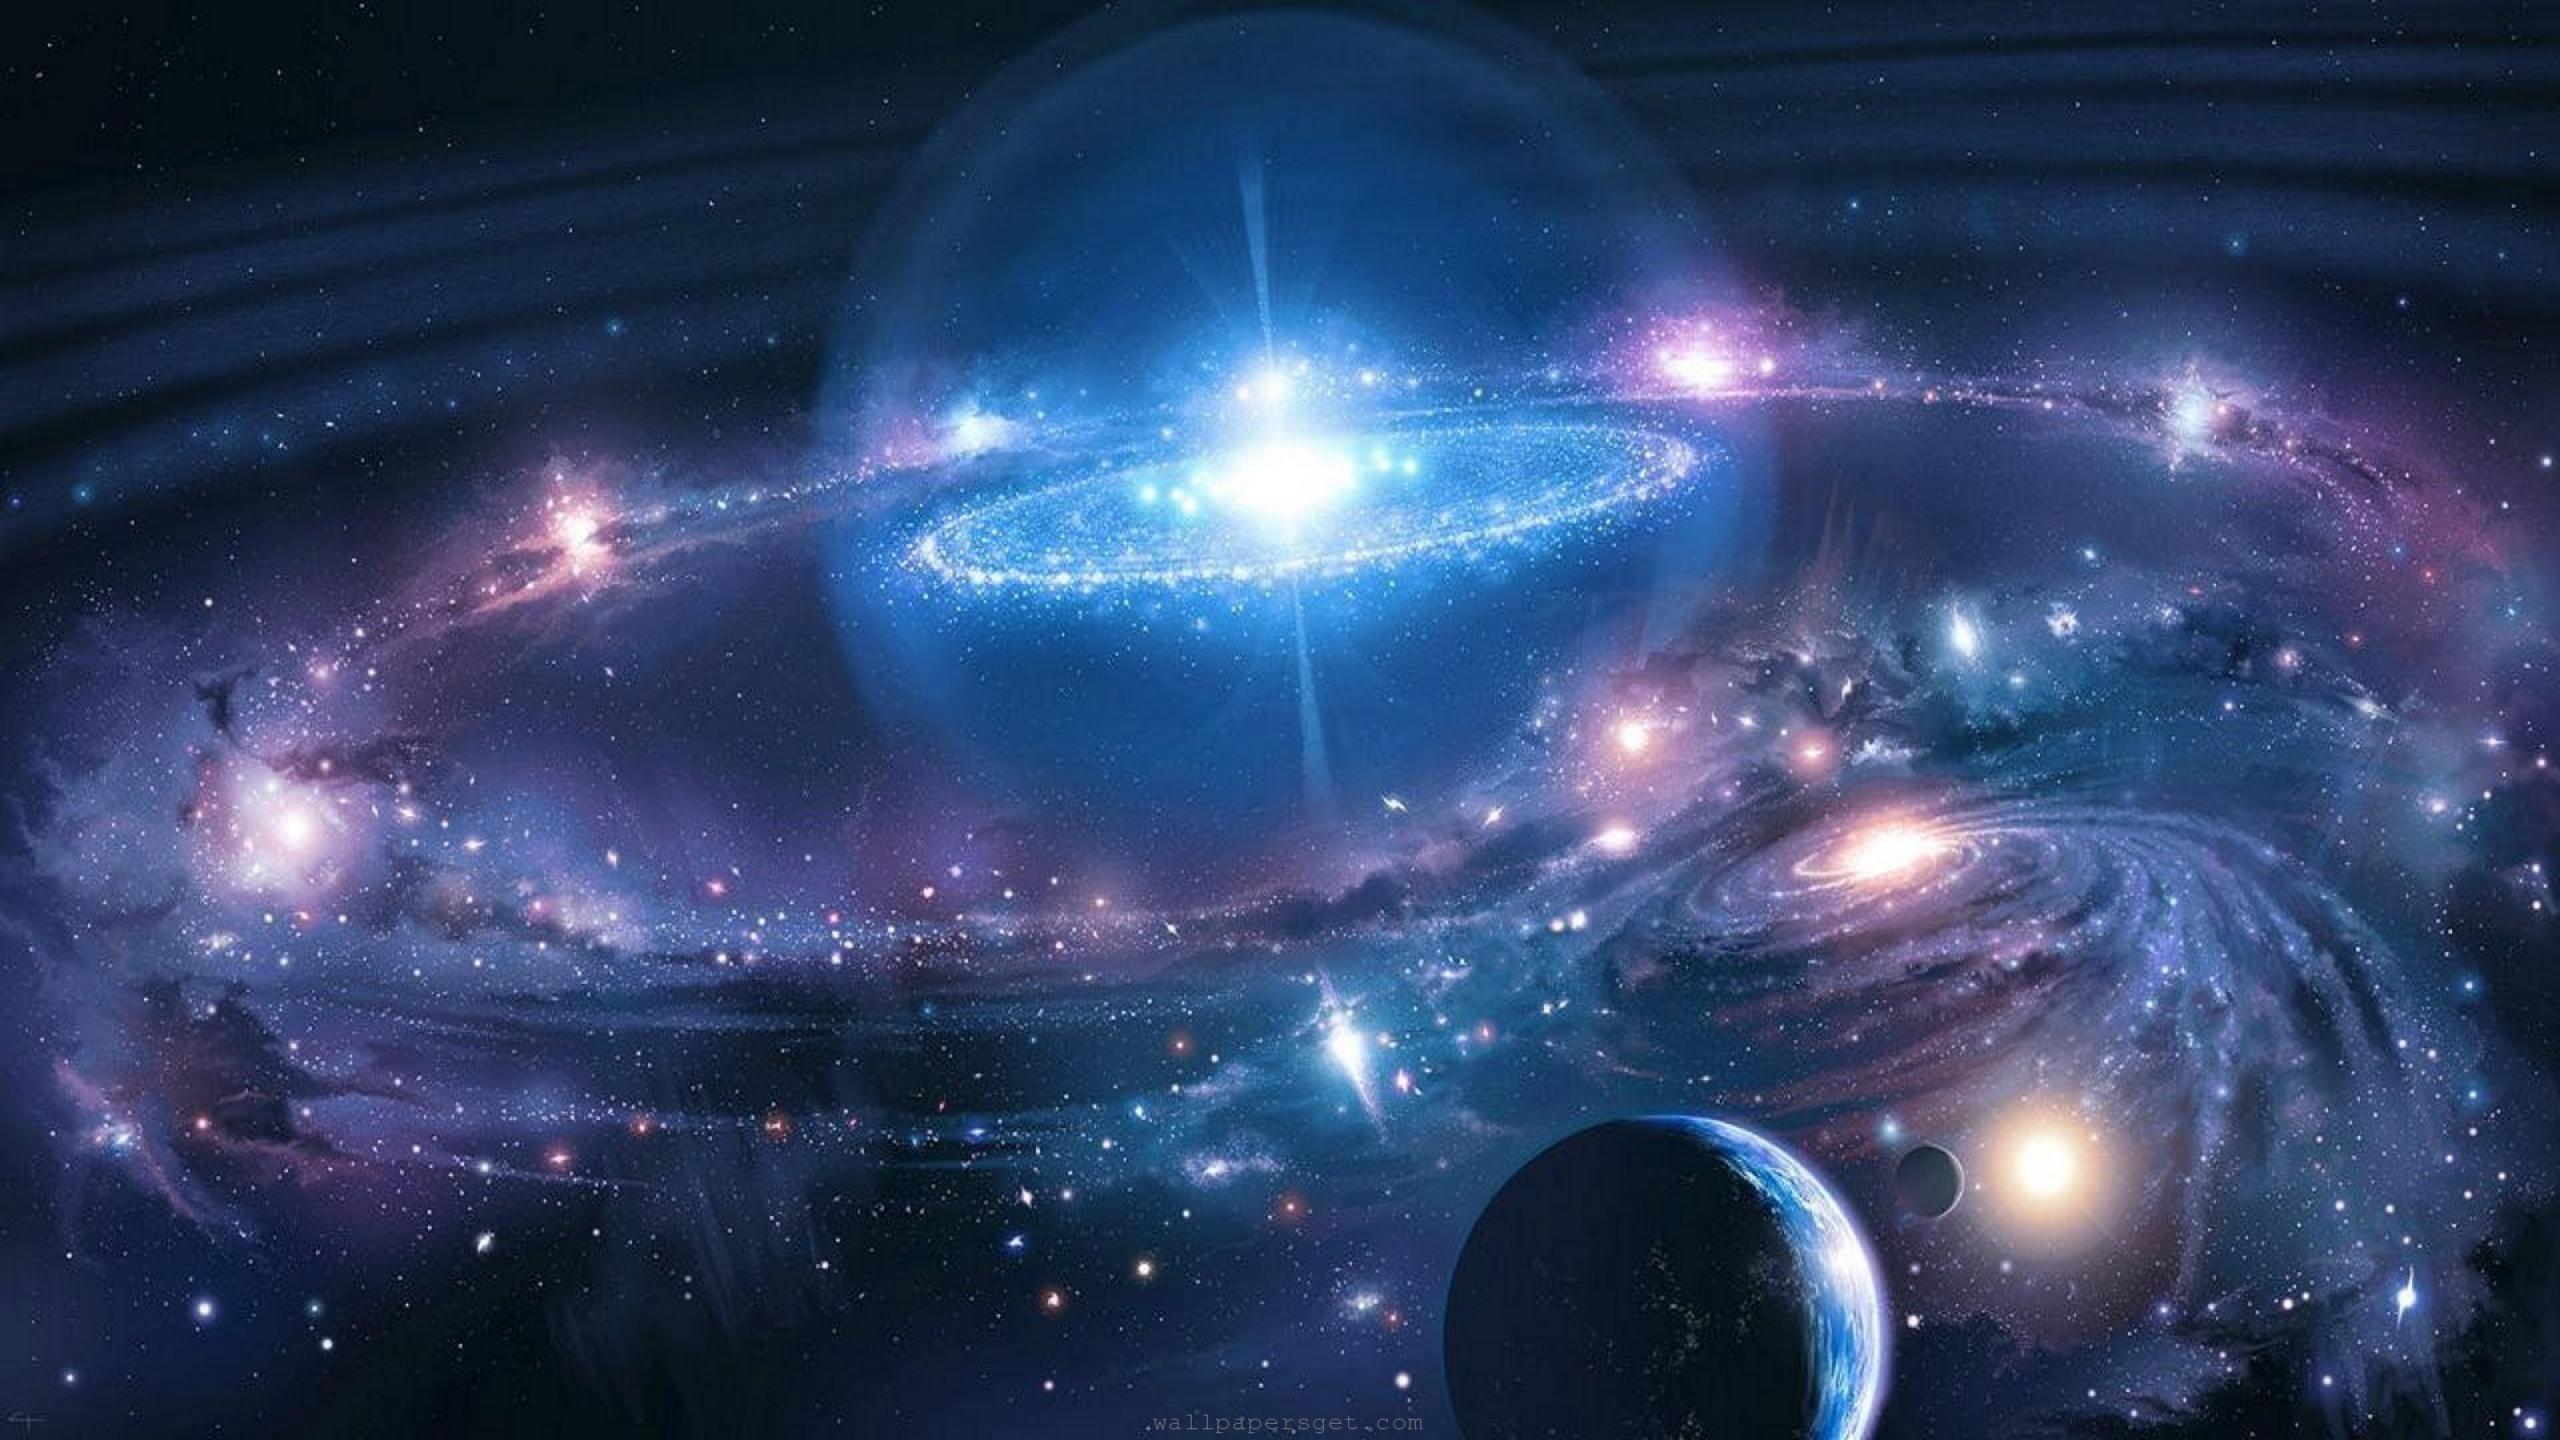 Alien Galaxy Wallpapers   Top Alien Galaxy Backgrounds 2560x1440